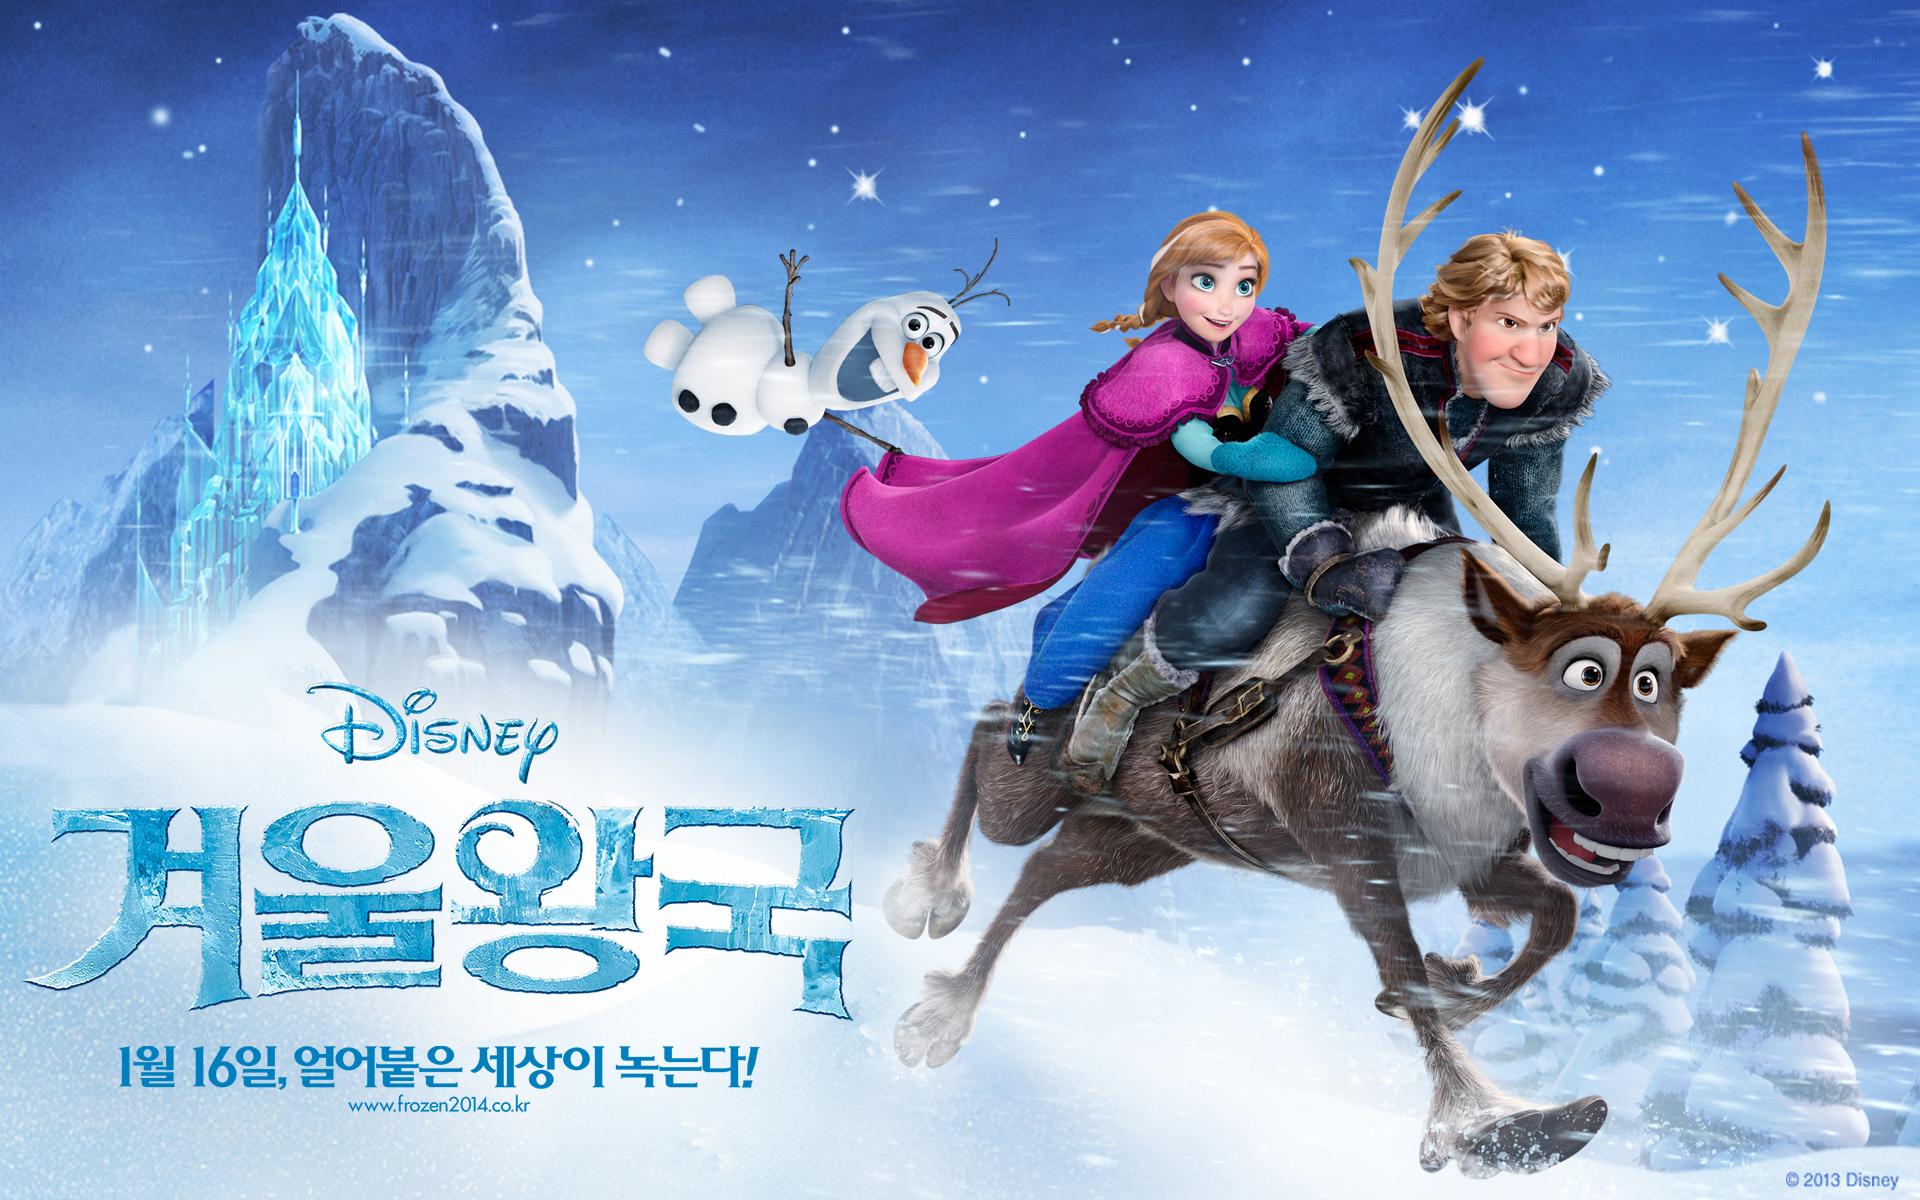 Frozen Korean Wallpapers - Olaf and Sven Wallpaper ...